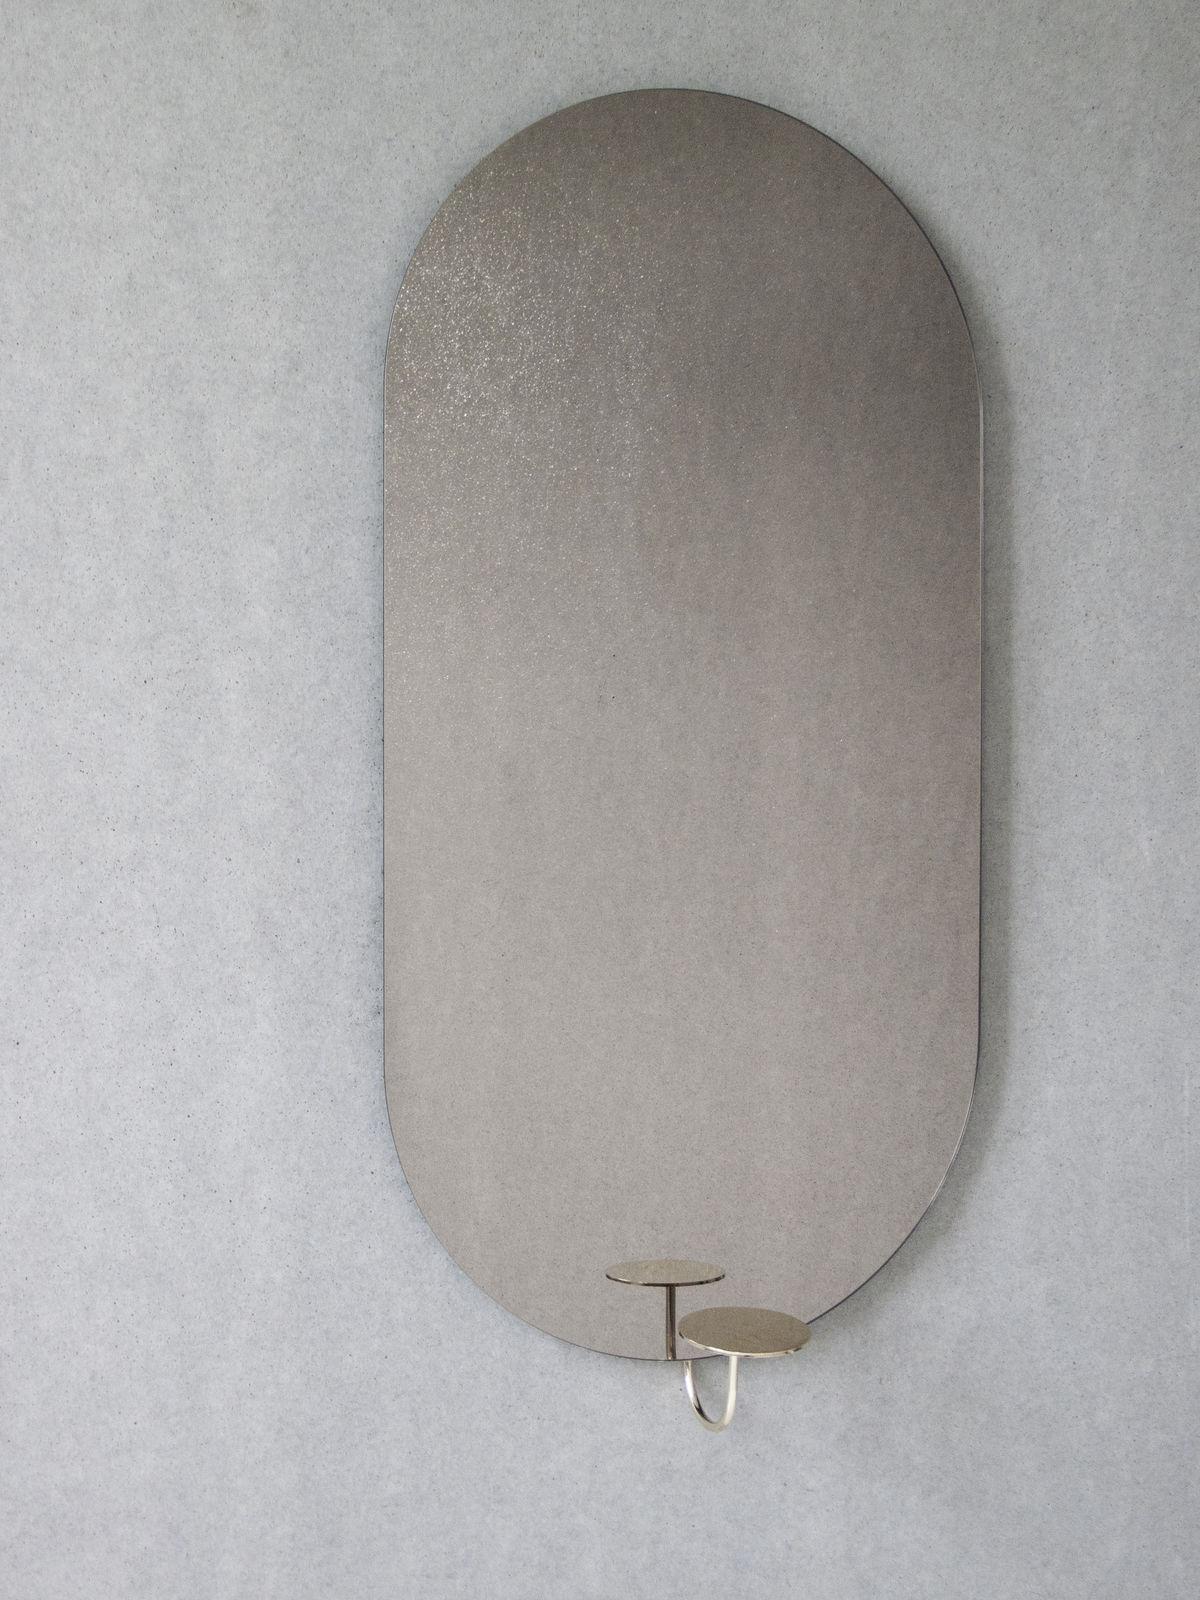 Friends & Founders Miró Miró Mirror Oval/Bronze